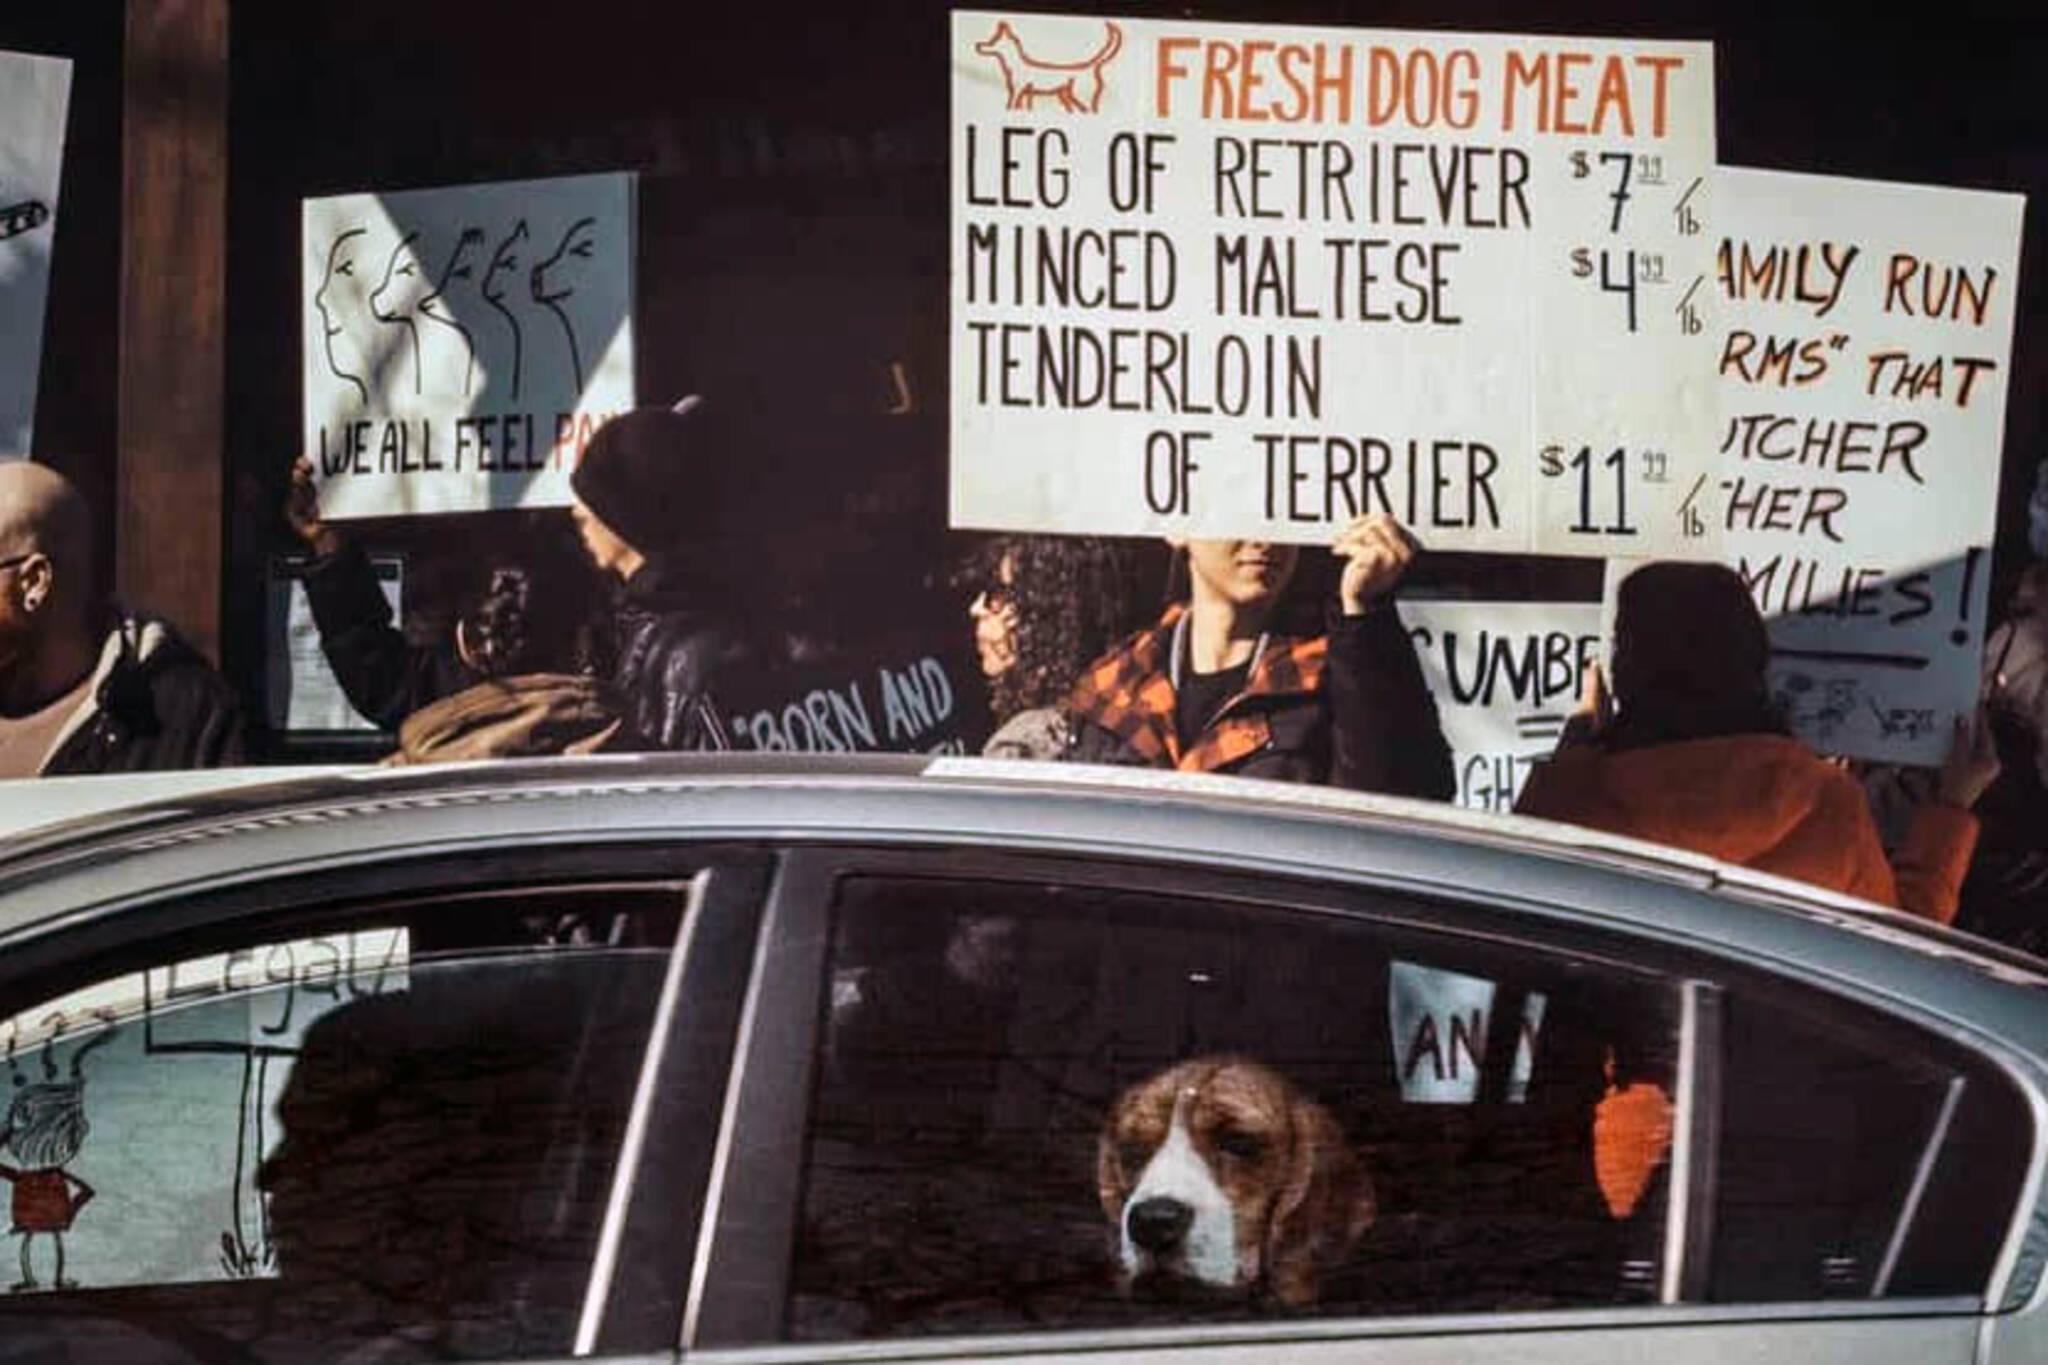 dog meat toronto